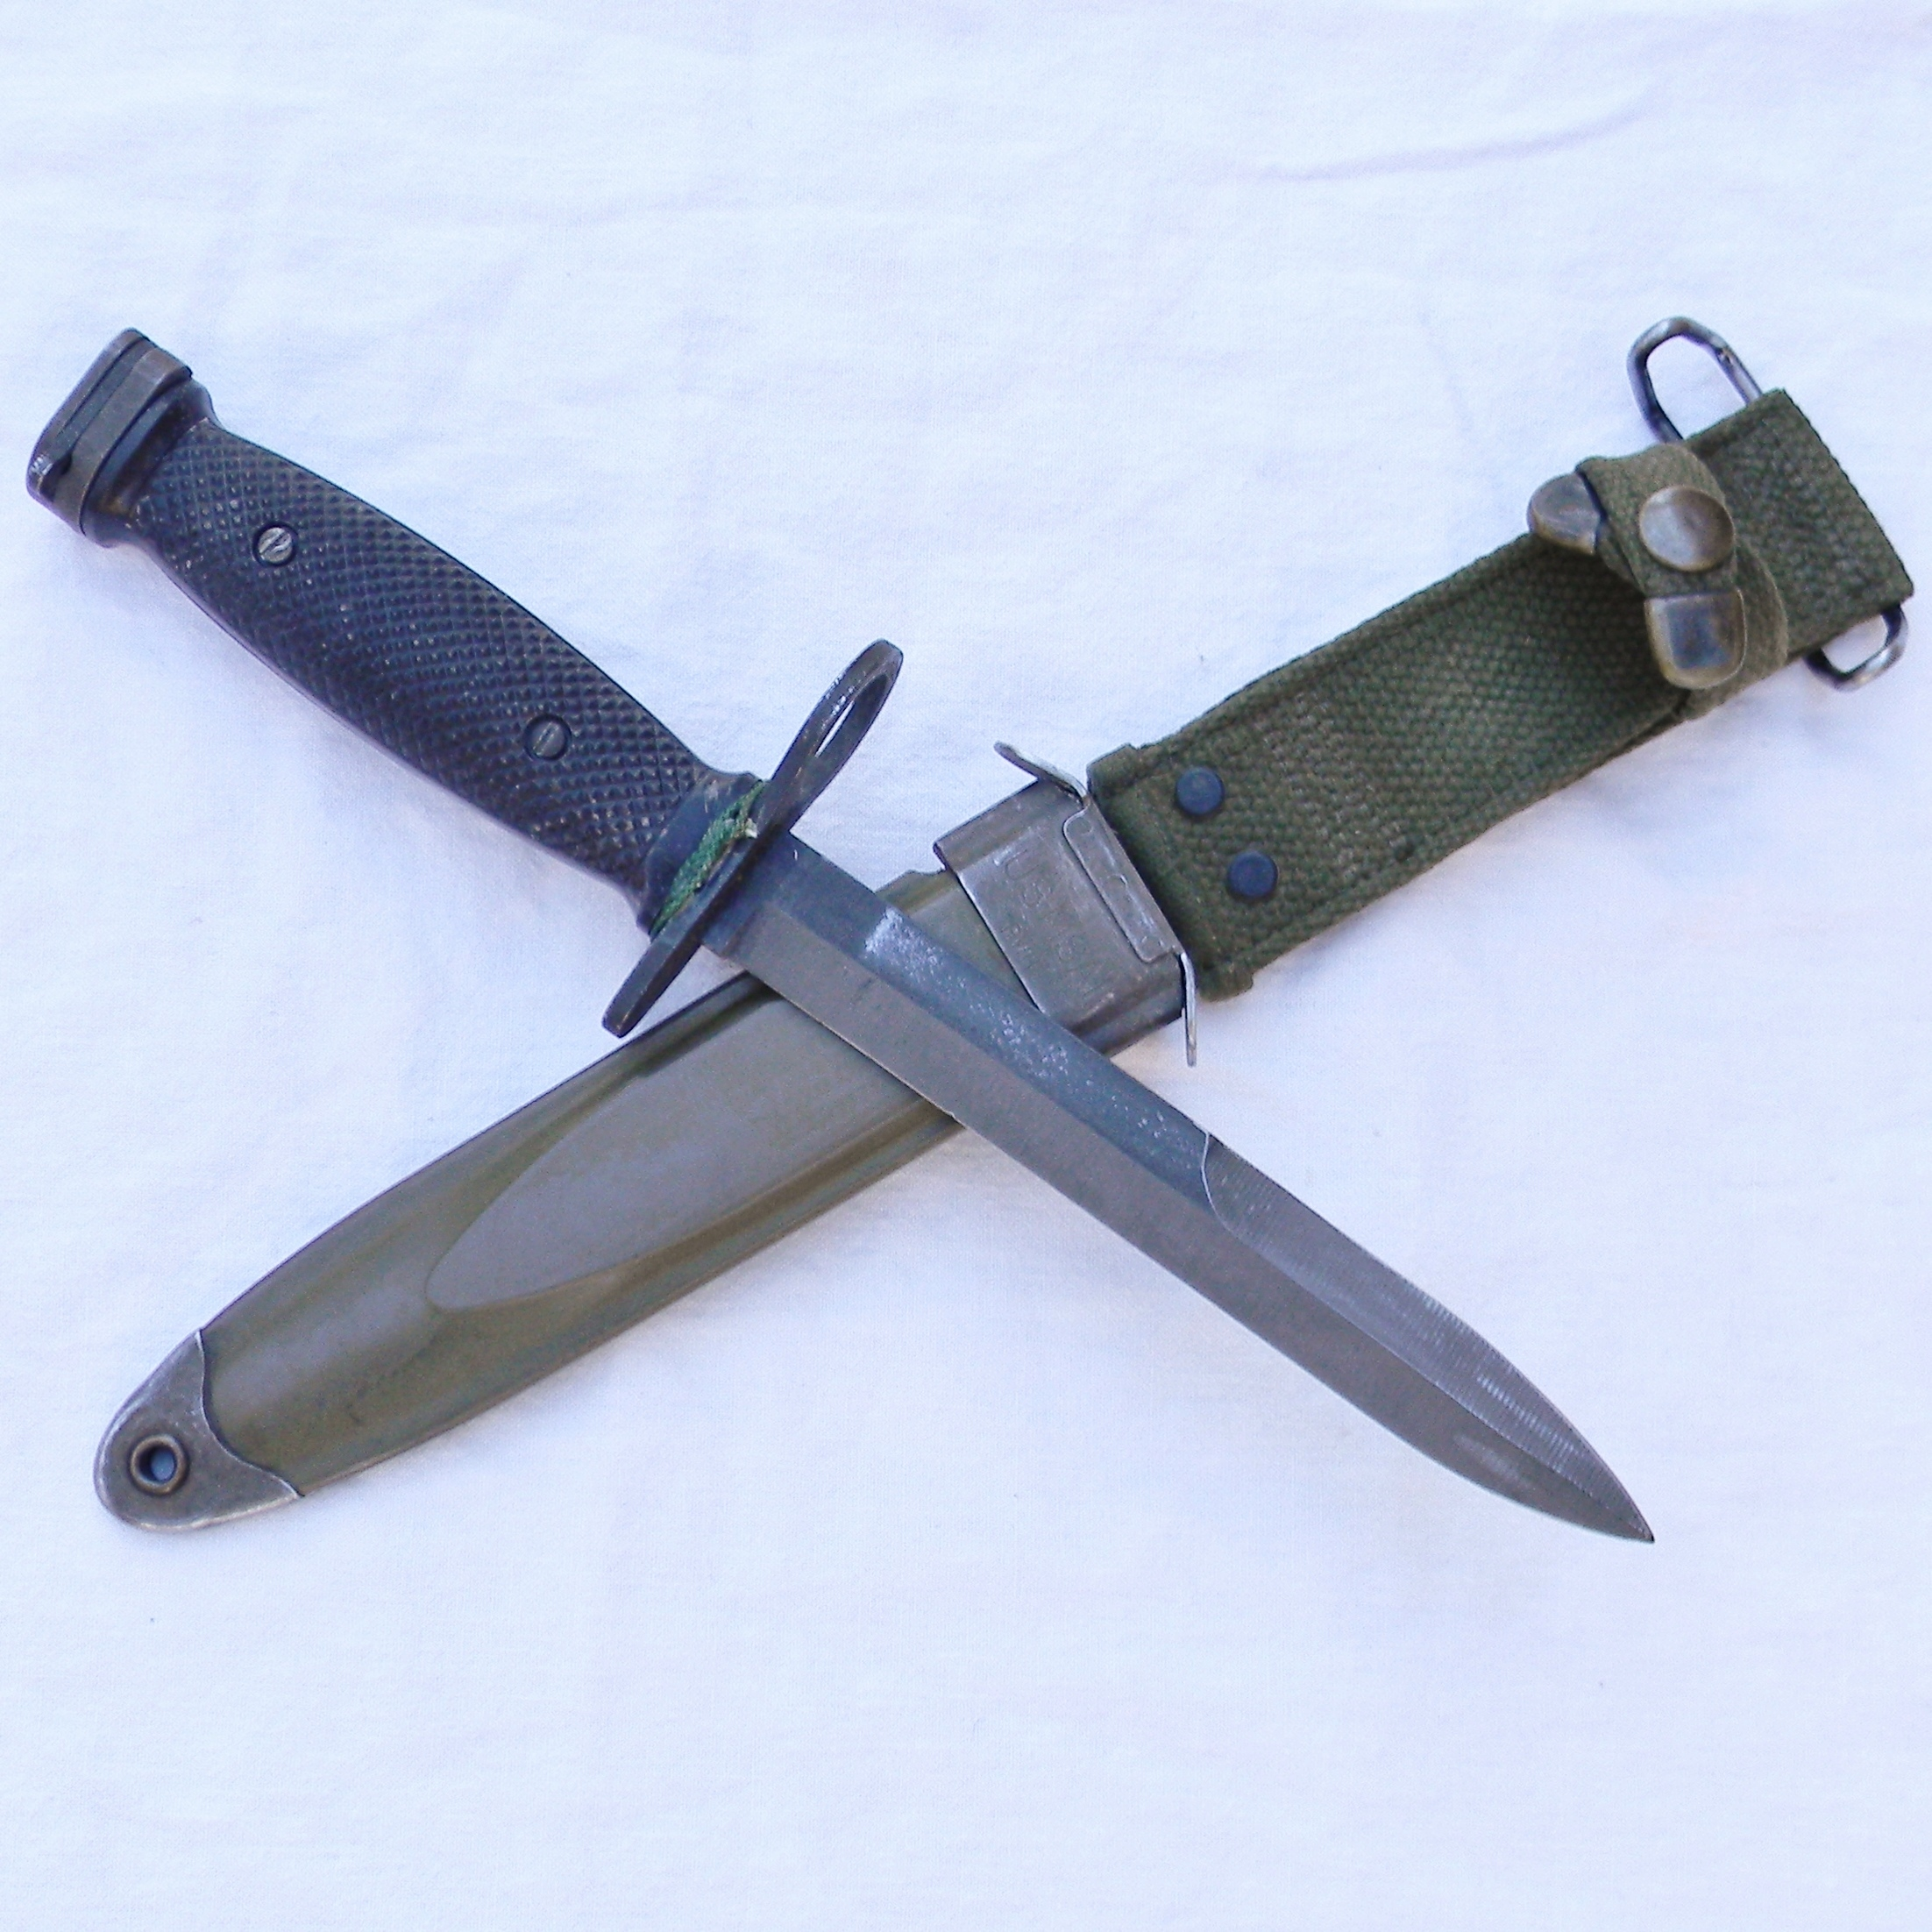 Vietnam War era US M7 bayonet for M16 by BOC, original M8A1